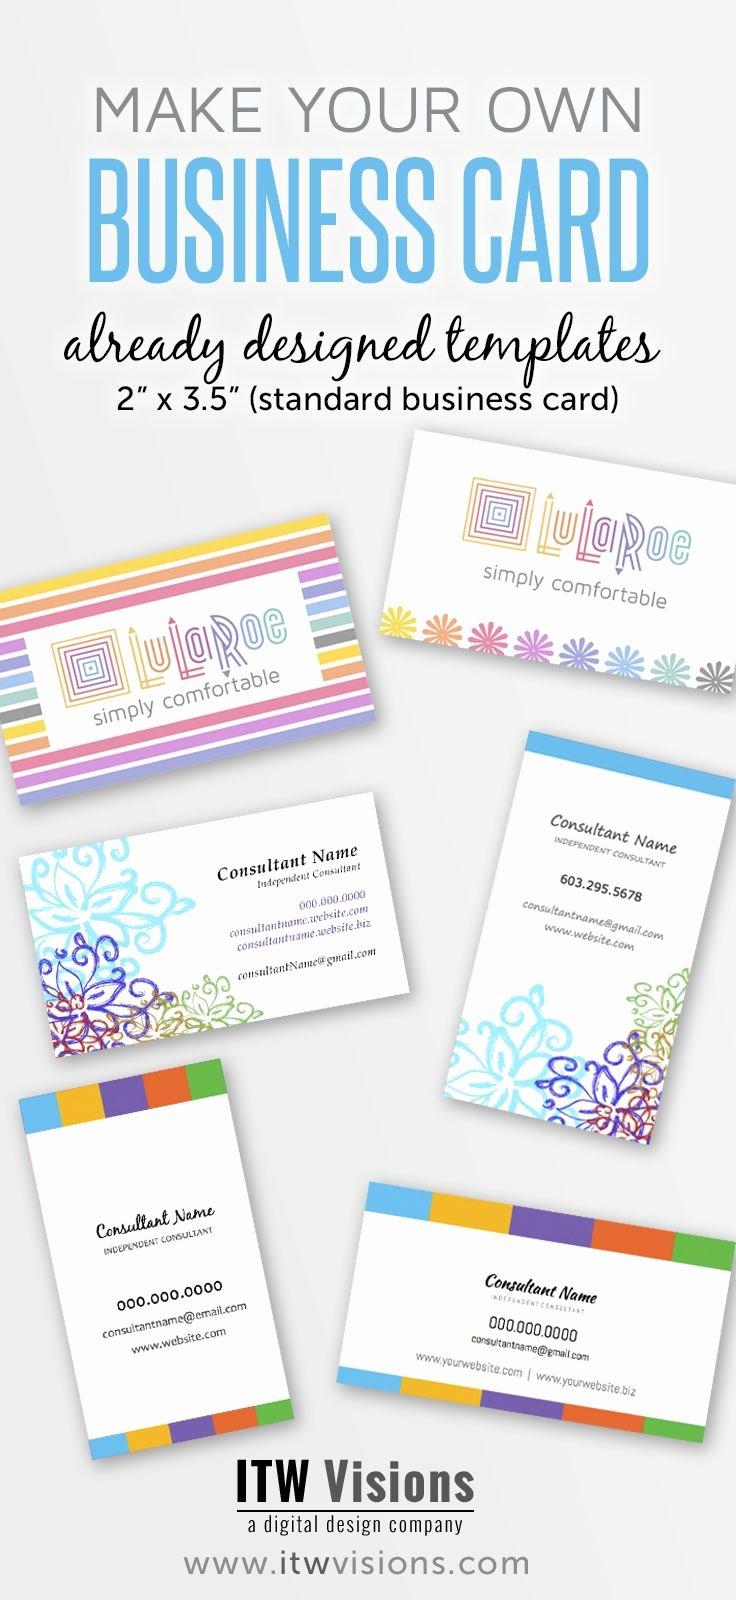 Lularoe Business Plan Template Unique 25 Best Ideas About Lularoe Business Cards On Pinterest